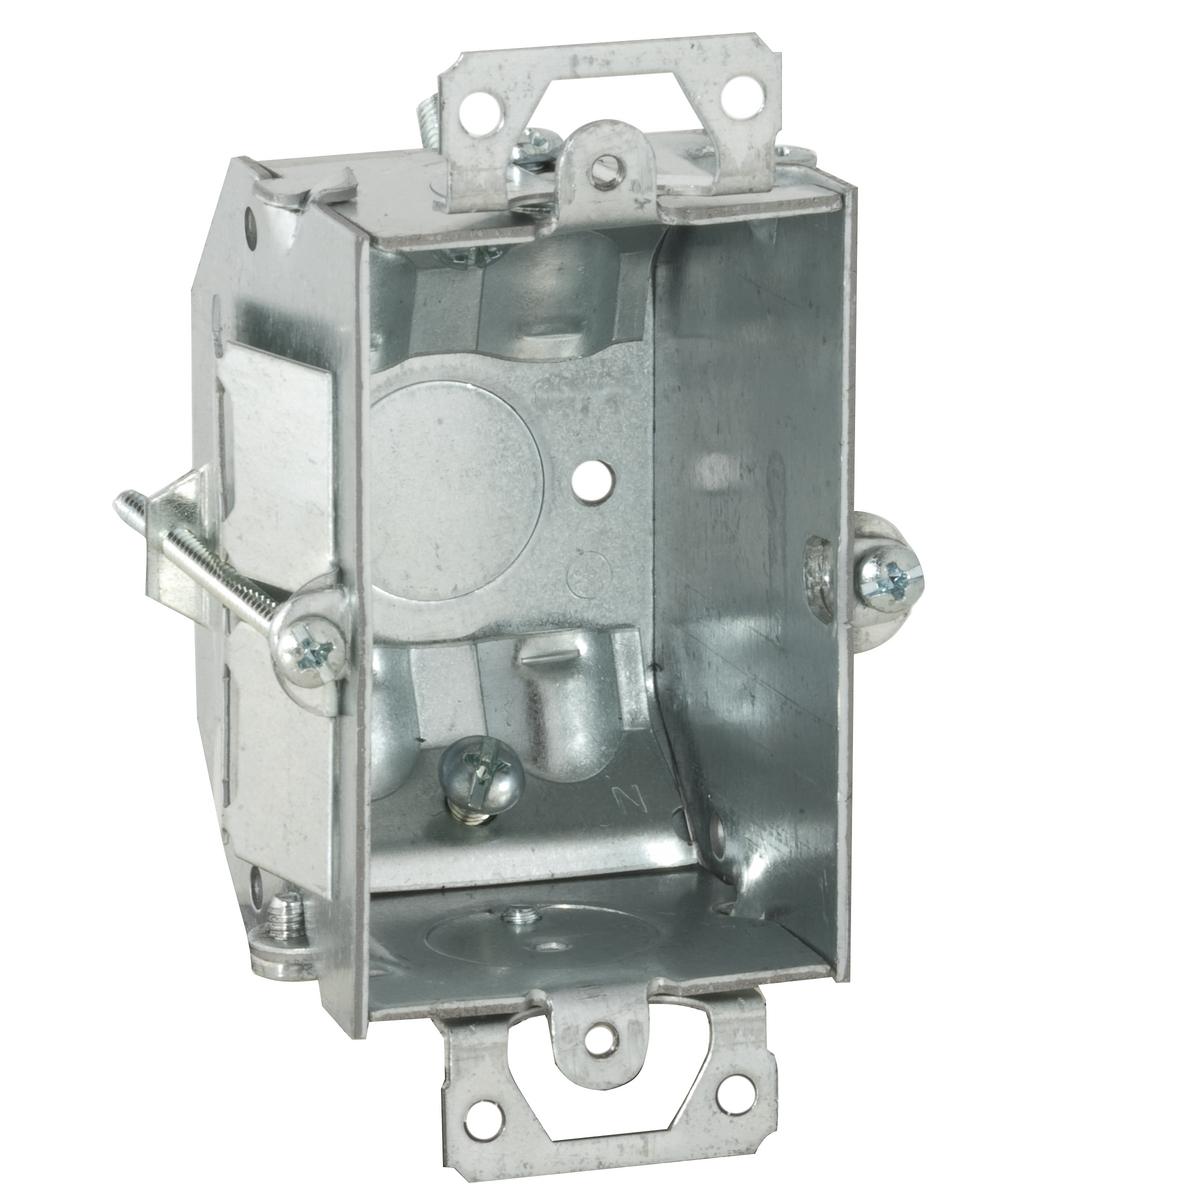 Hubbell-Raco 487 TIGERGRIP Switch Box